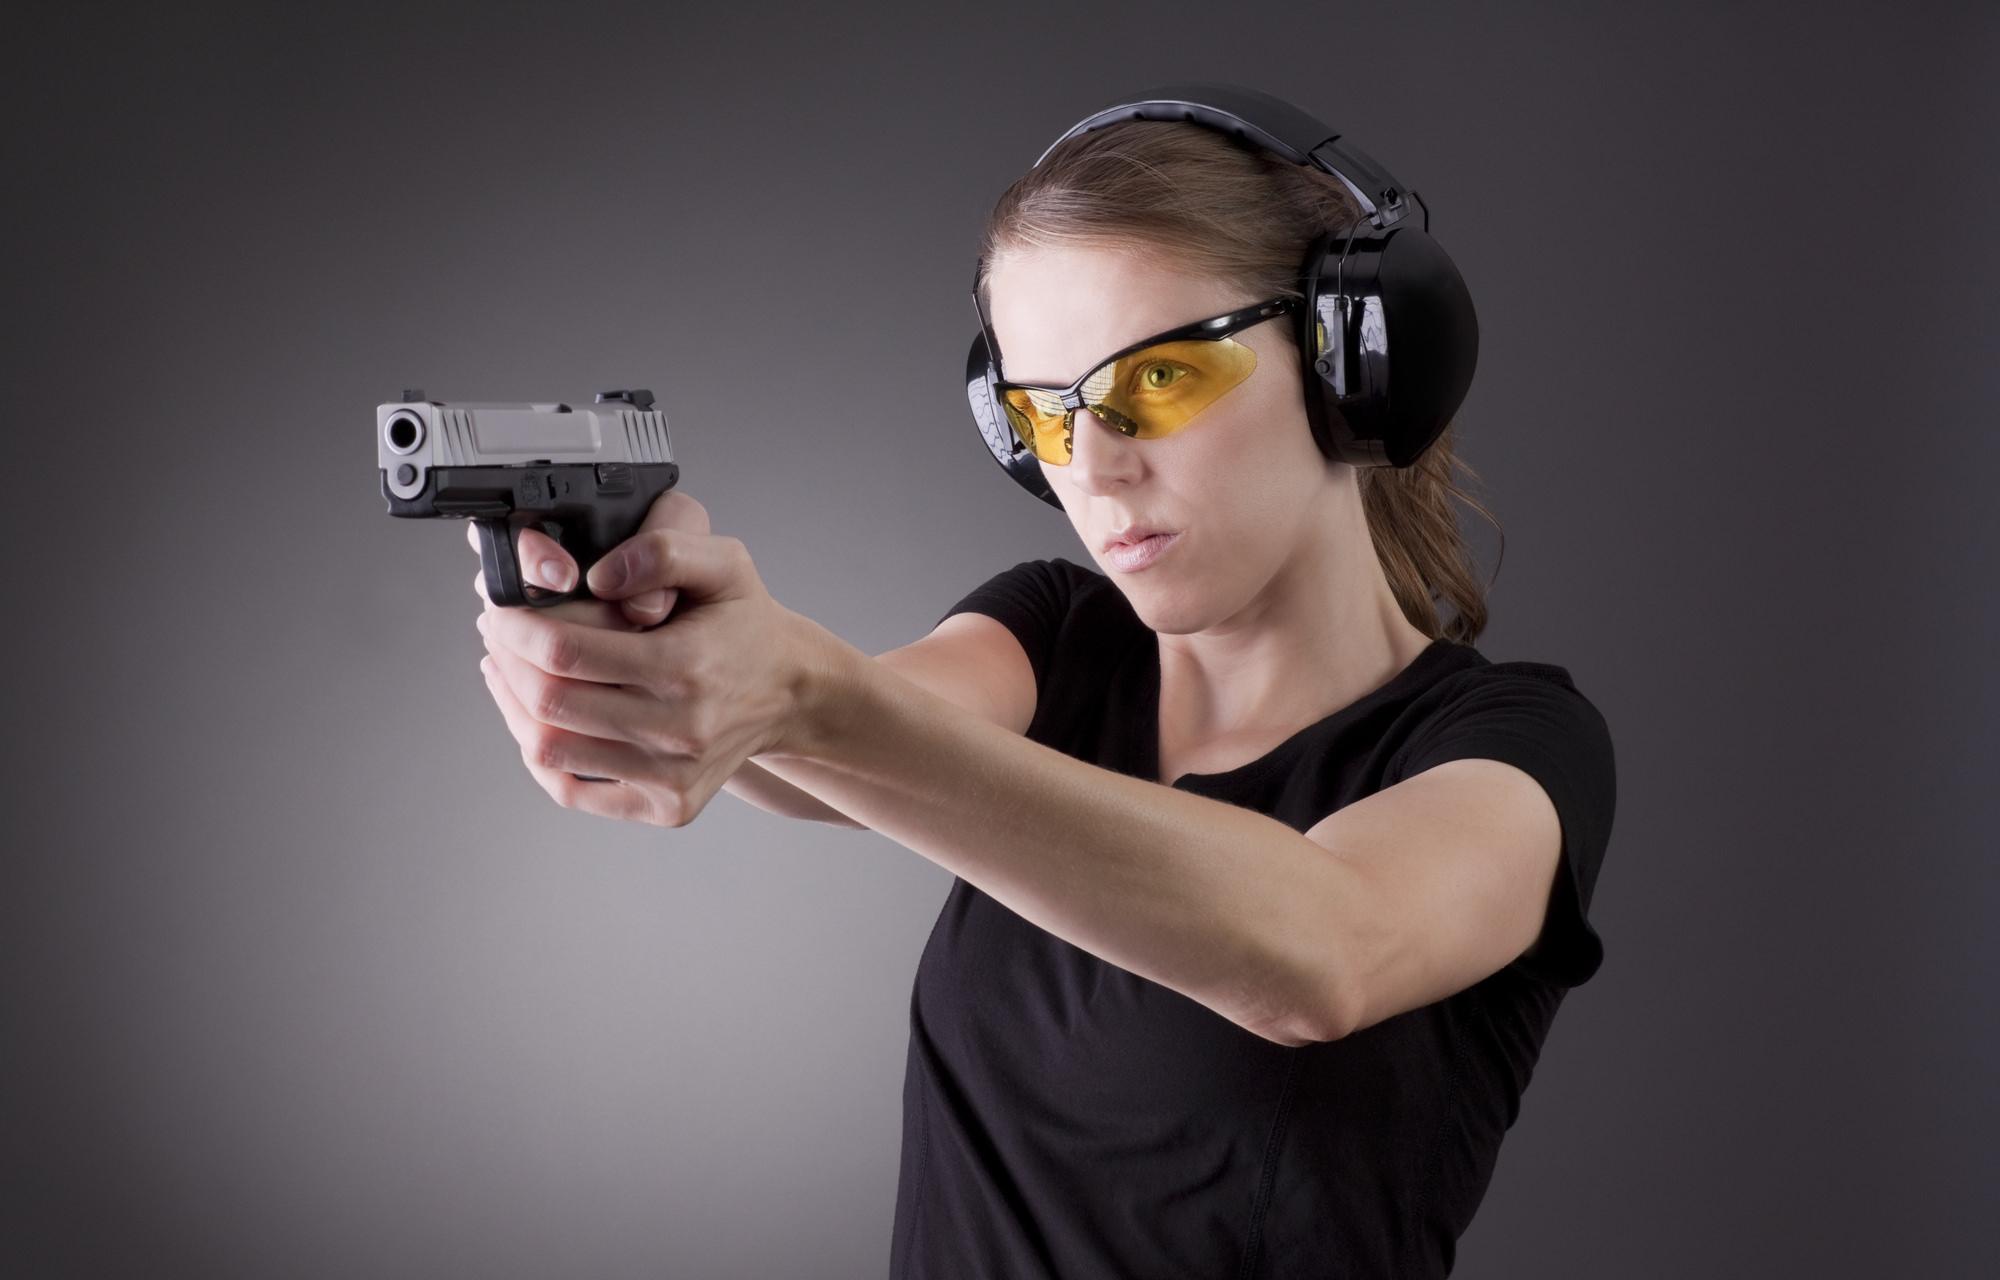 5 Key Health Benefits of Going to a Gun Range